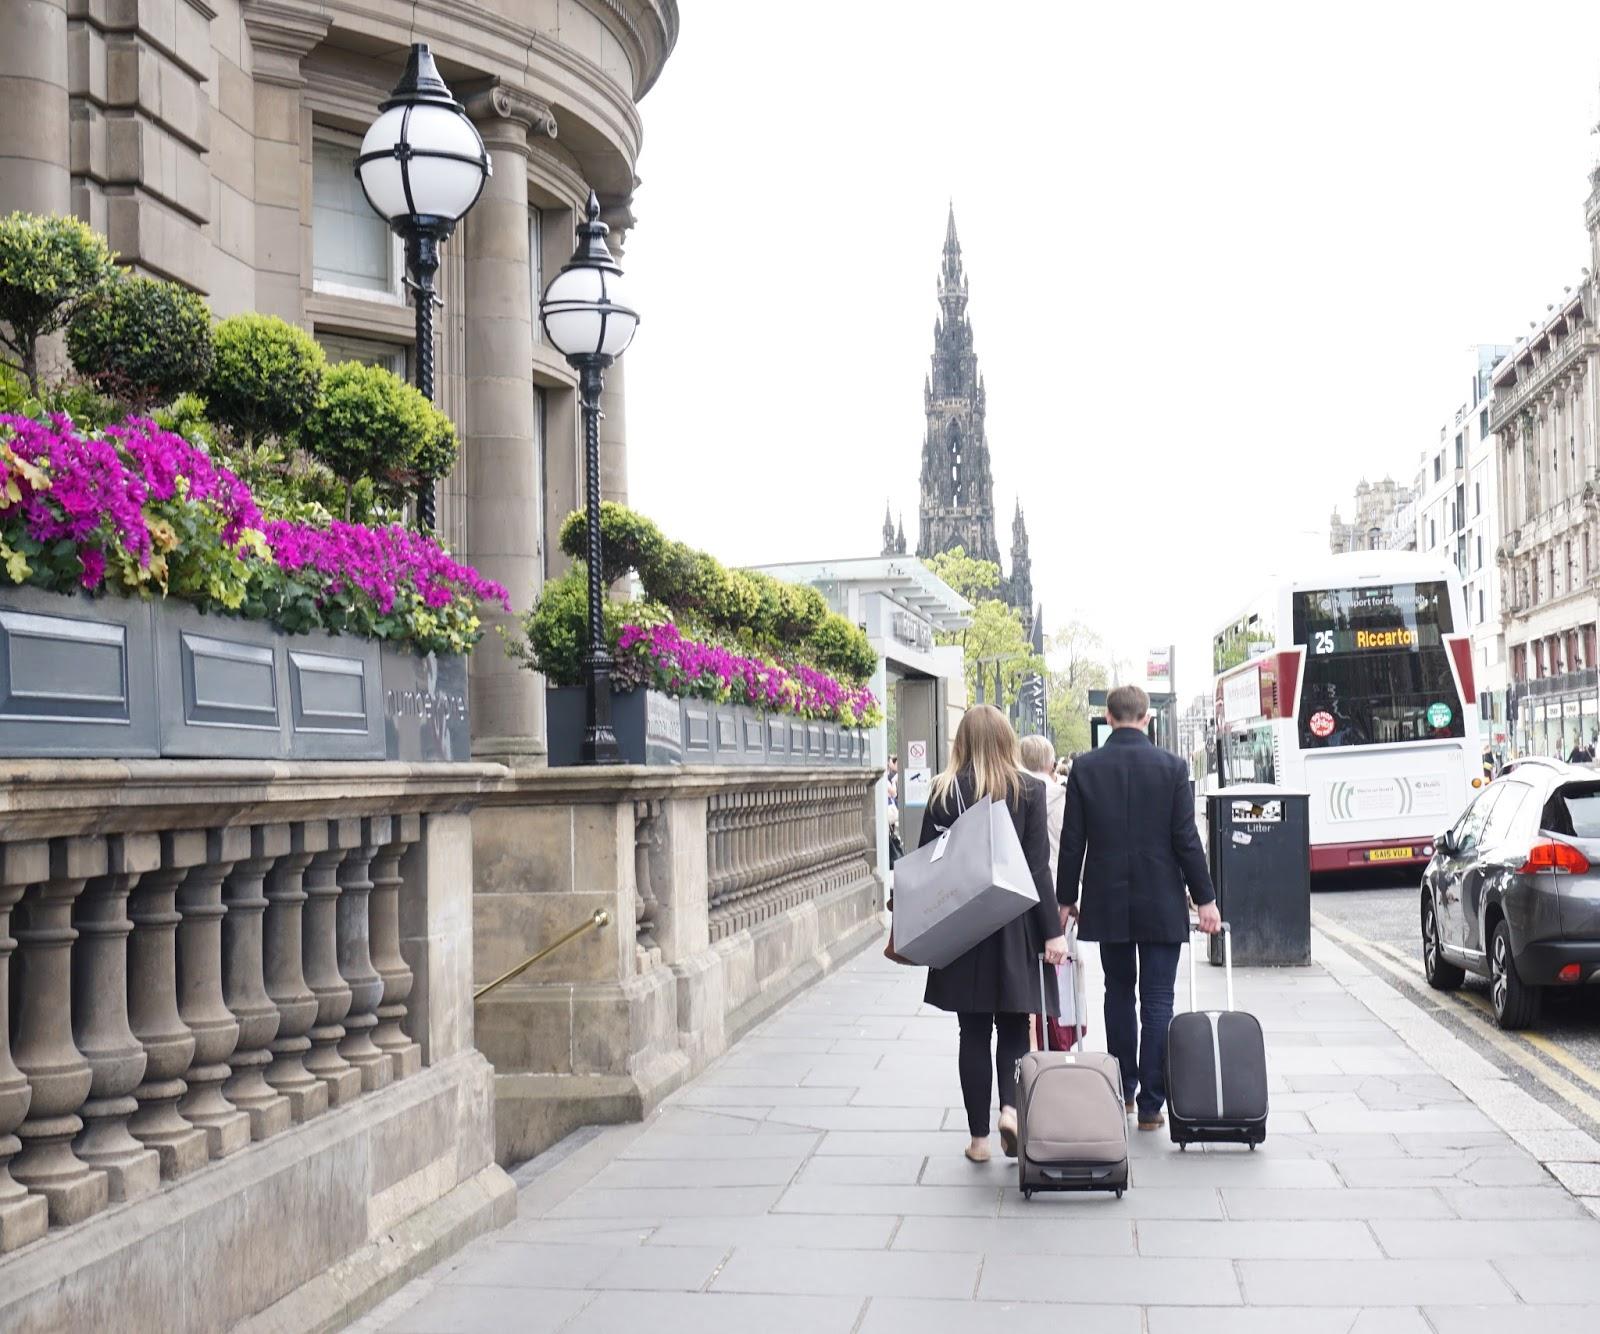 Street Edinburgh